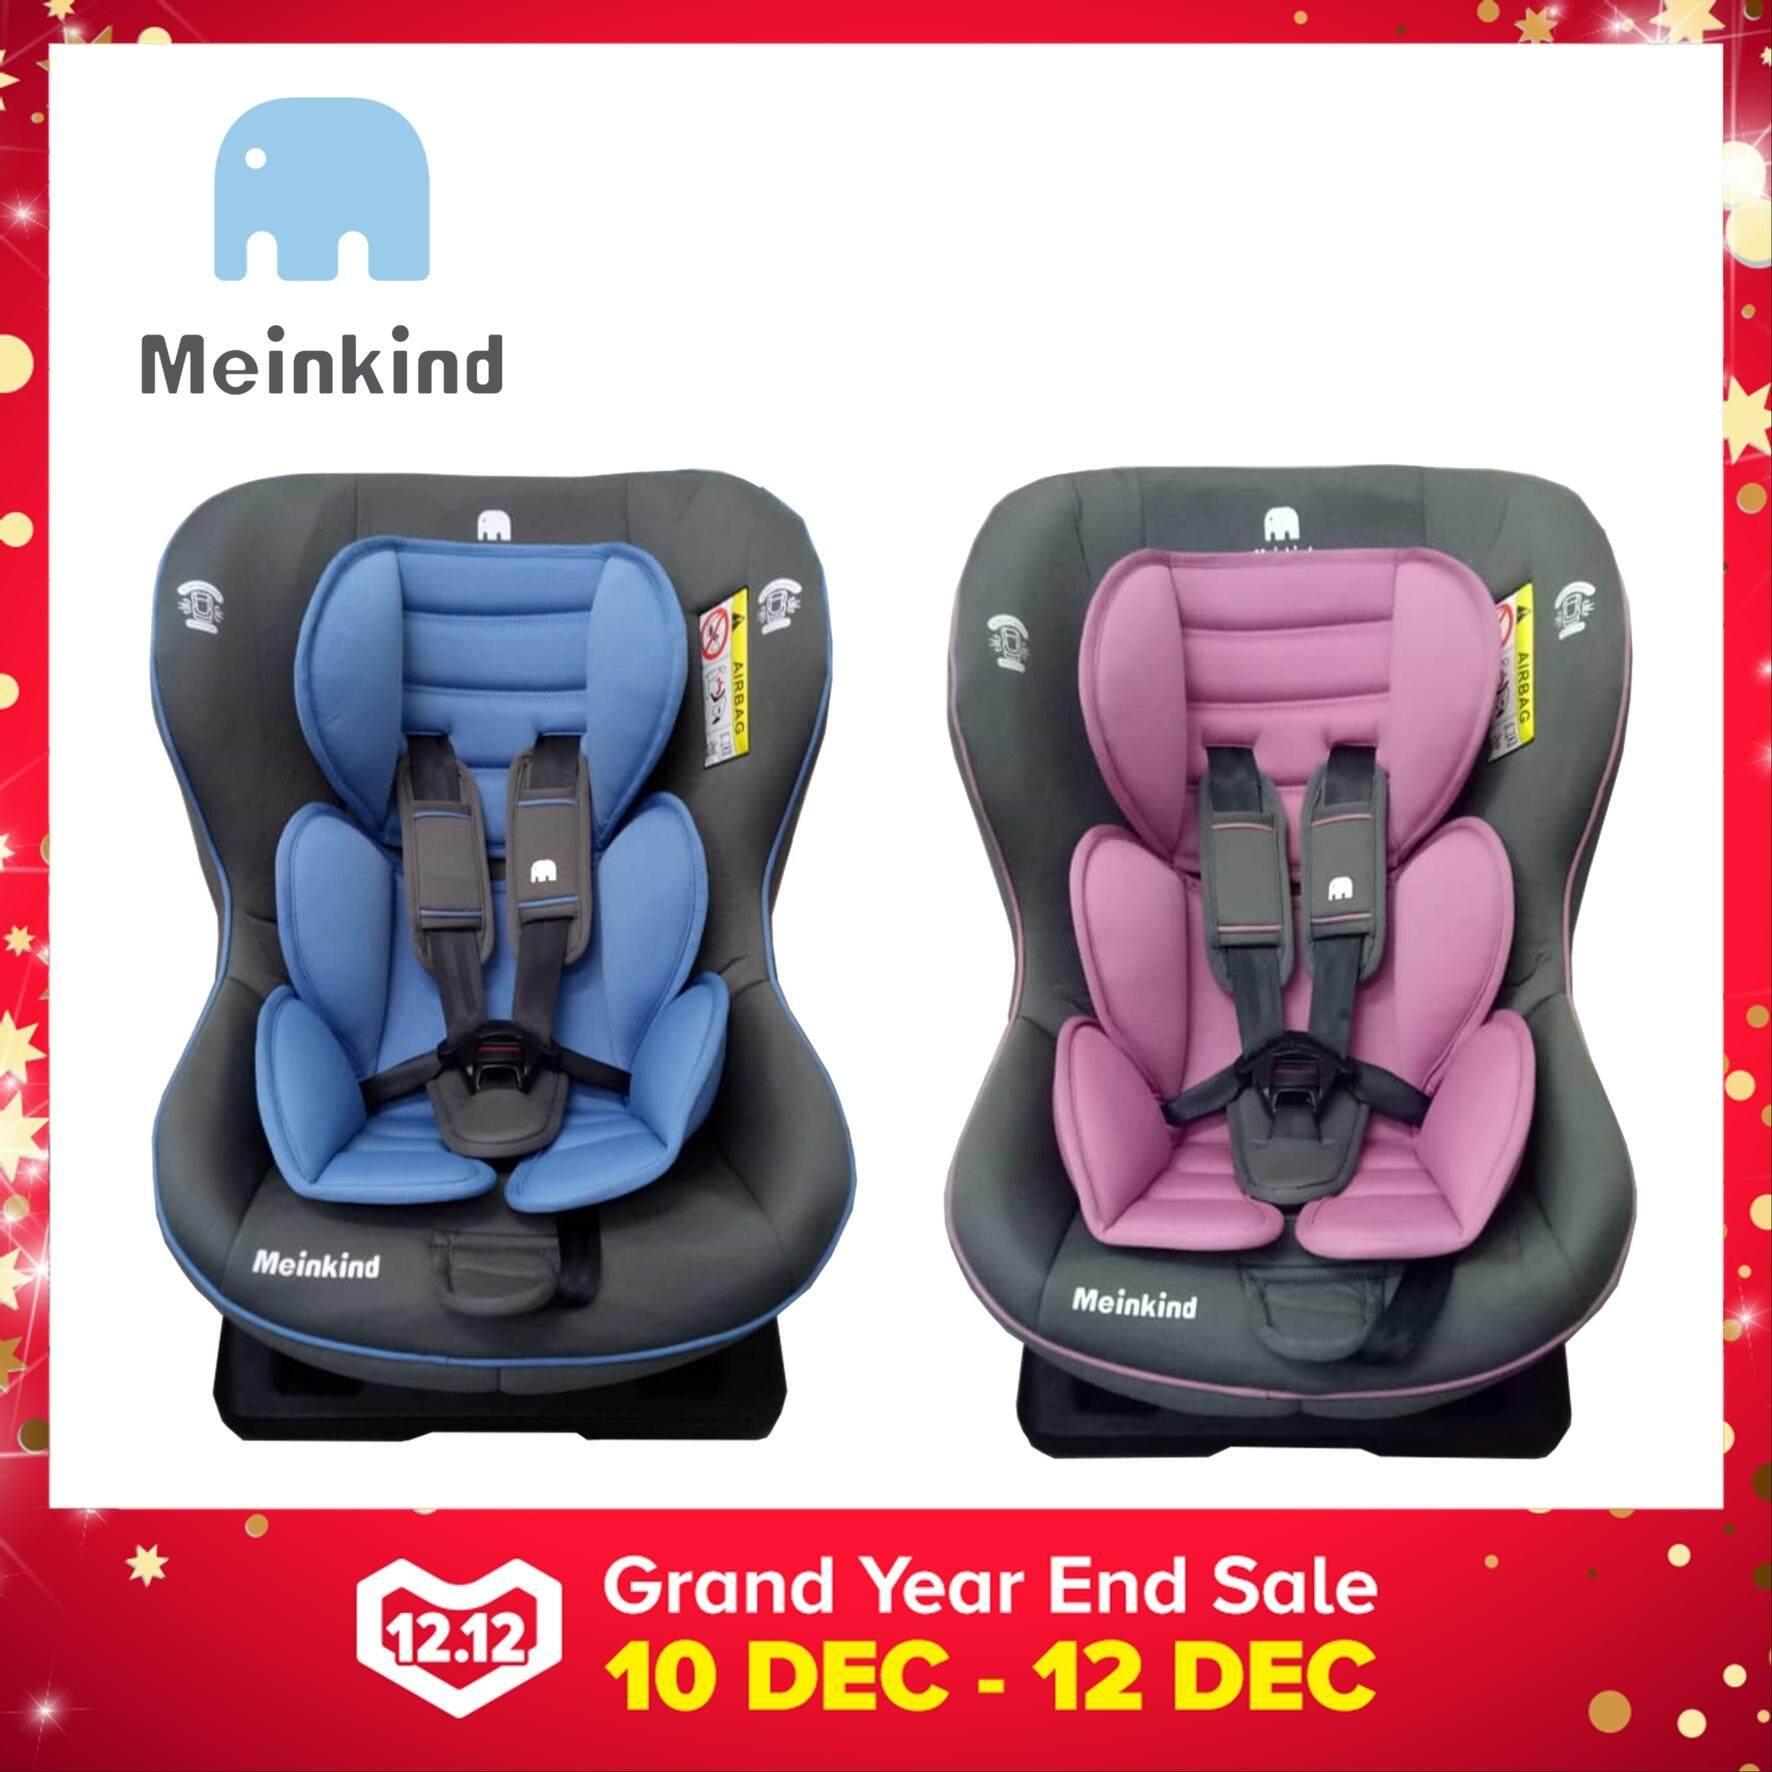 Meinkind M1 Convertible Car Seat From Newborn To 18KG German Engineered